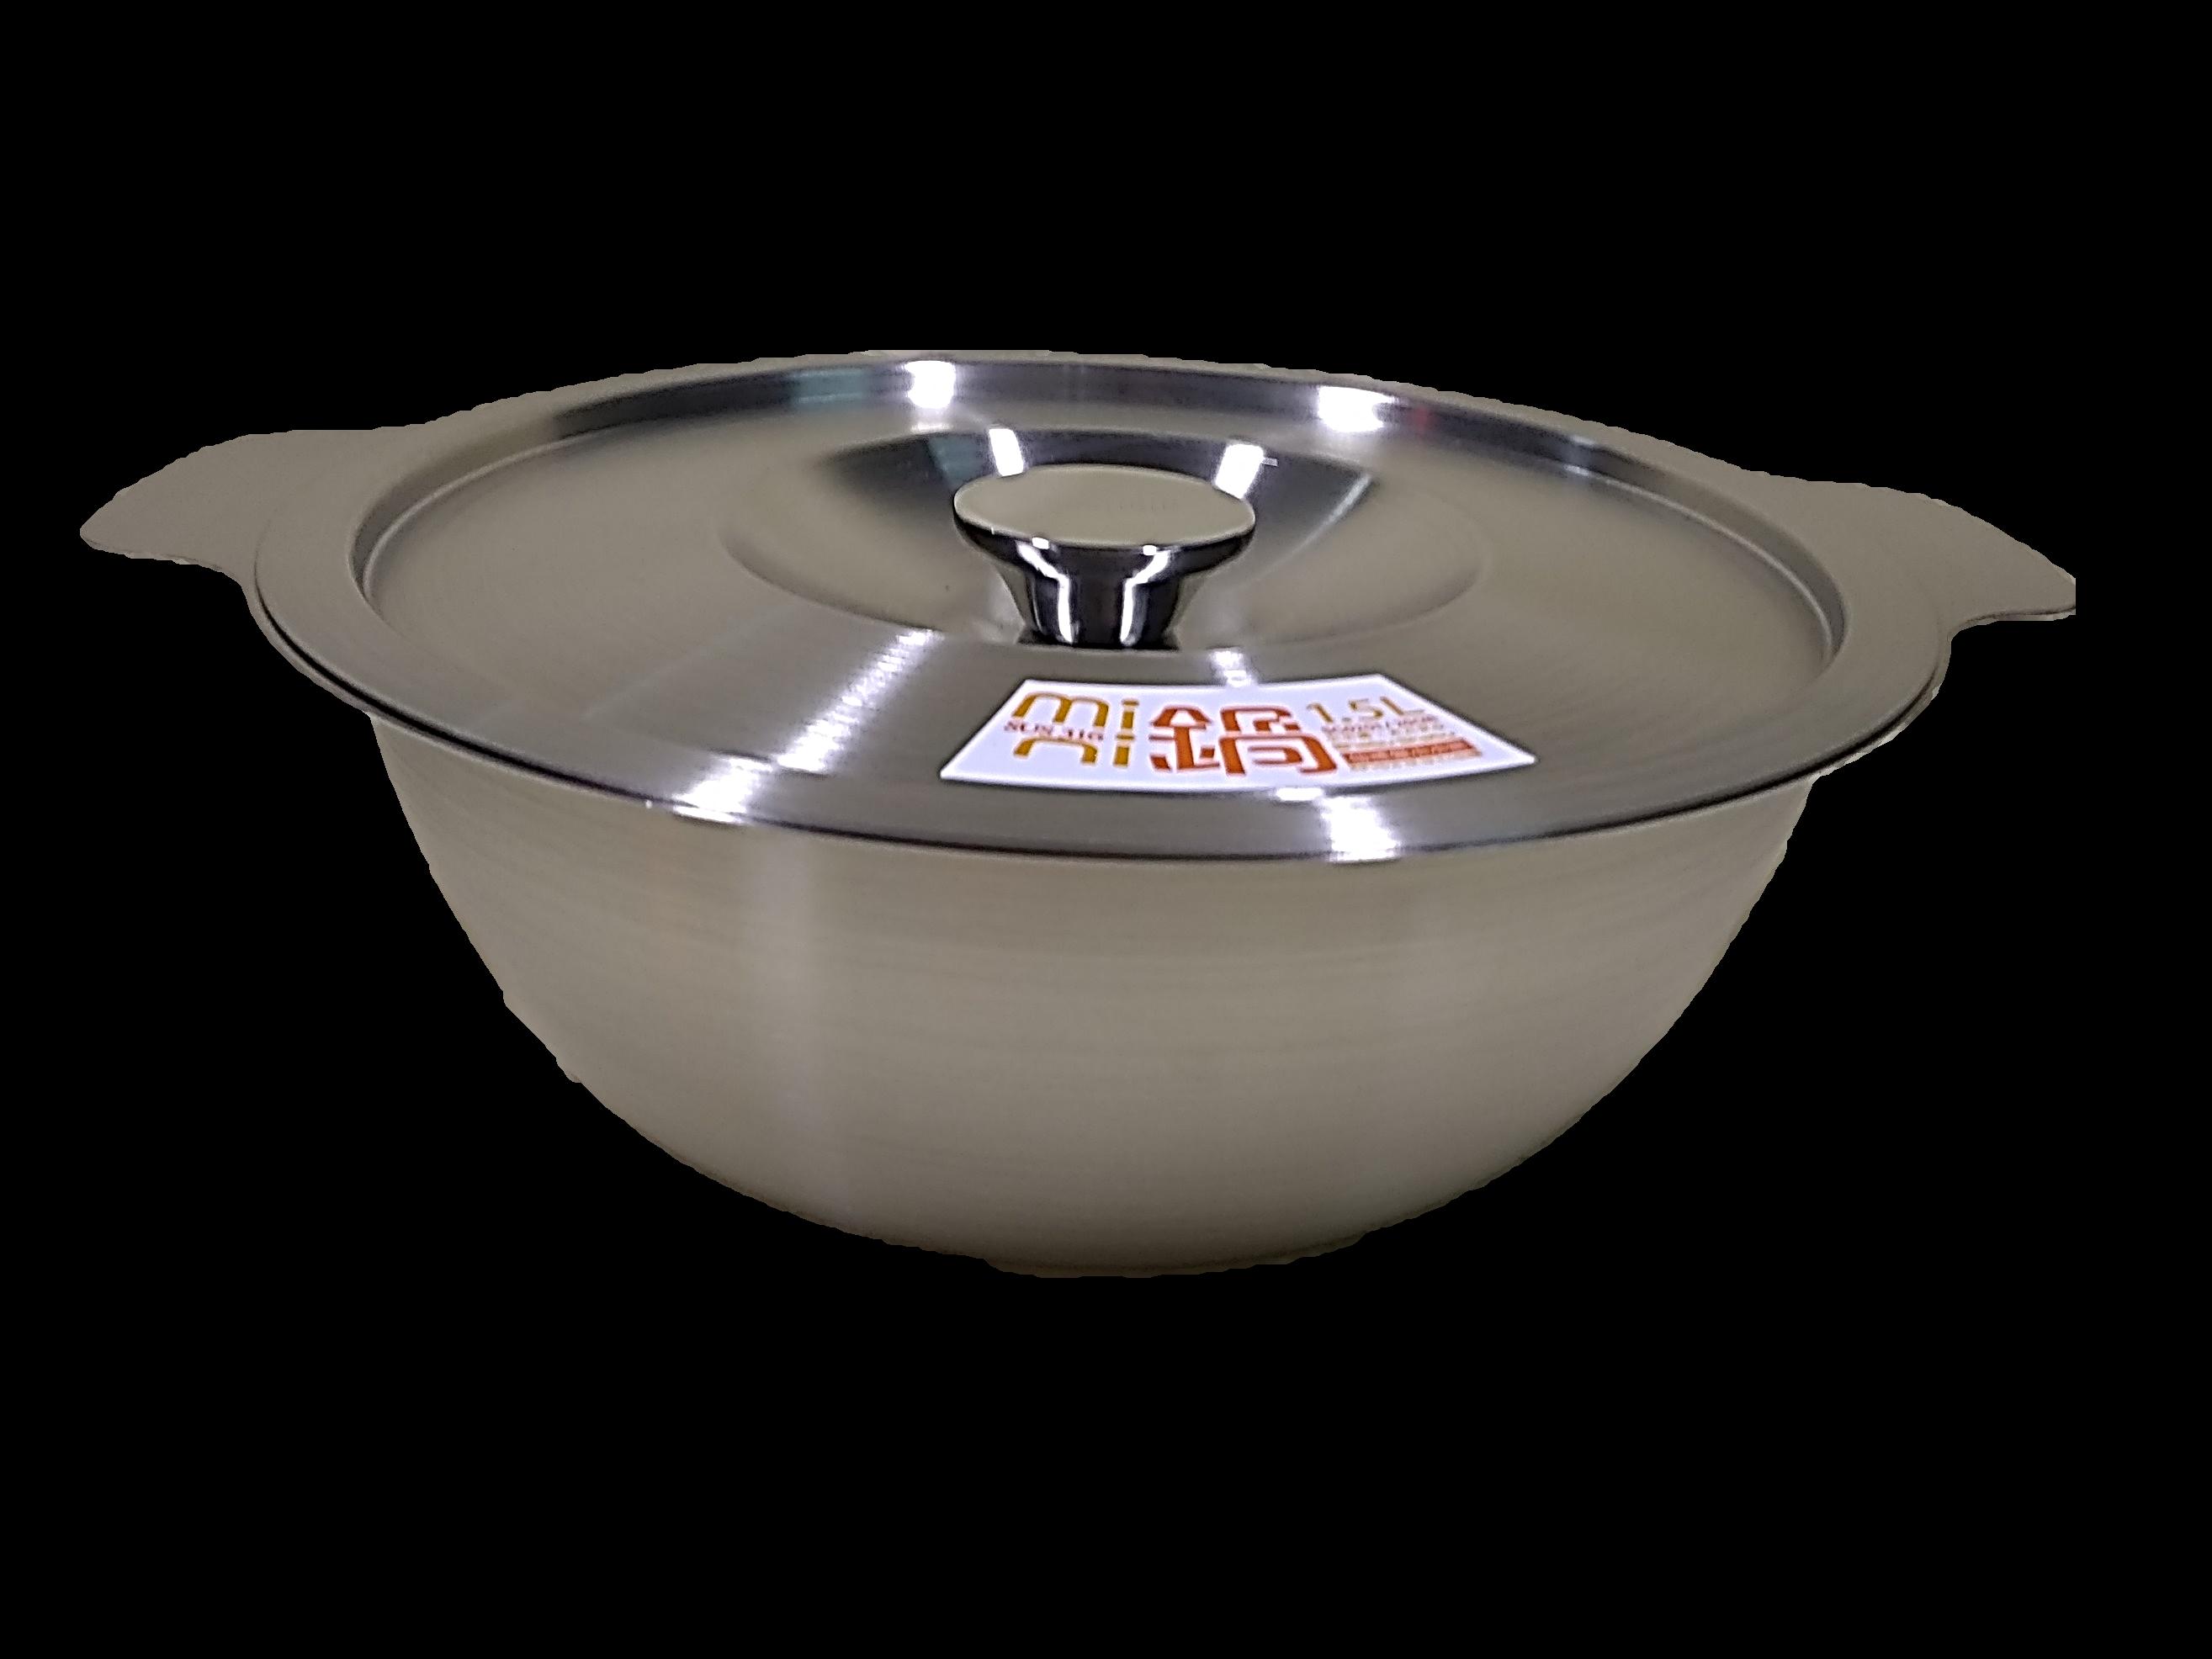 SADOMAIN 仙德曼小小煮鍋 #SUS316#Mini鍋#小火鍋/不鏽鋼鍋具/煮鍋/鍋具